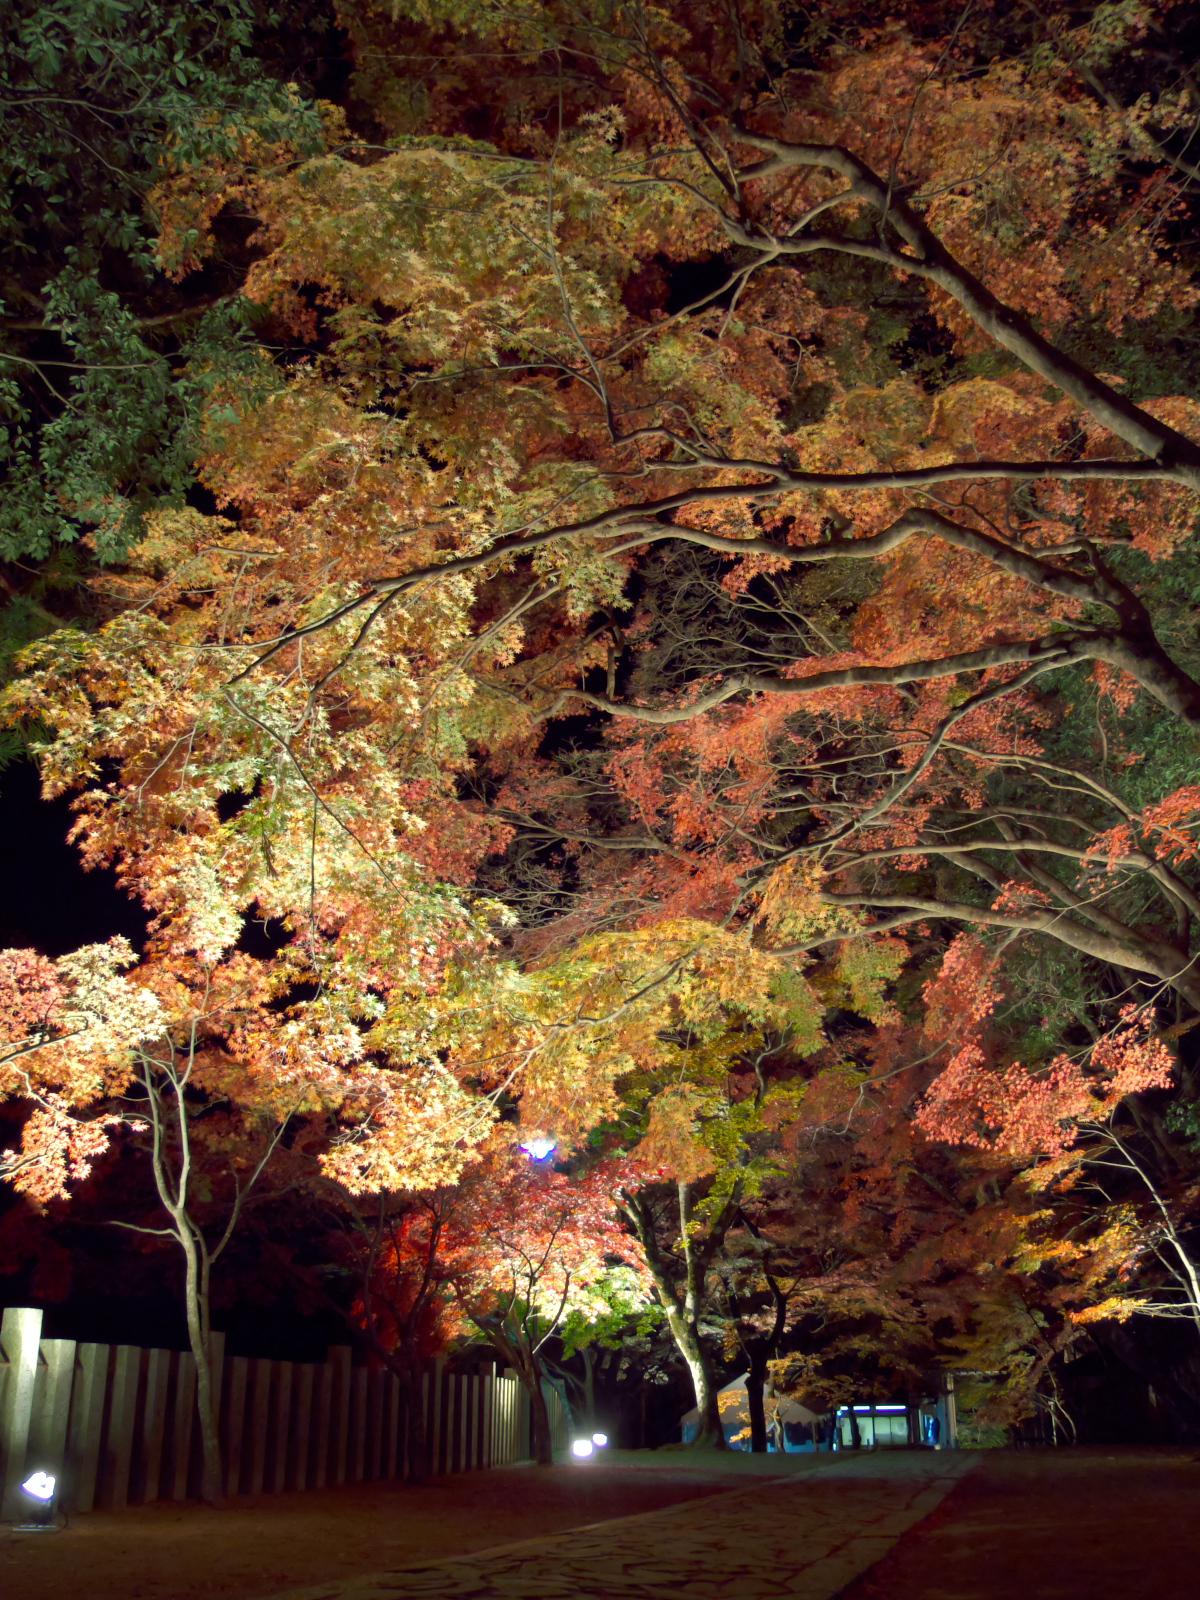 http://www.eigenji-t.jp/admission/images/DSCF2191.jpg